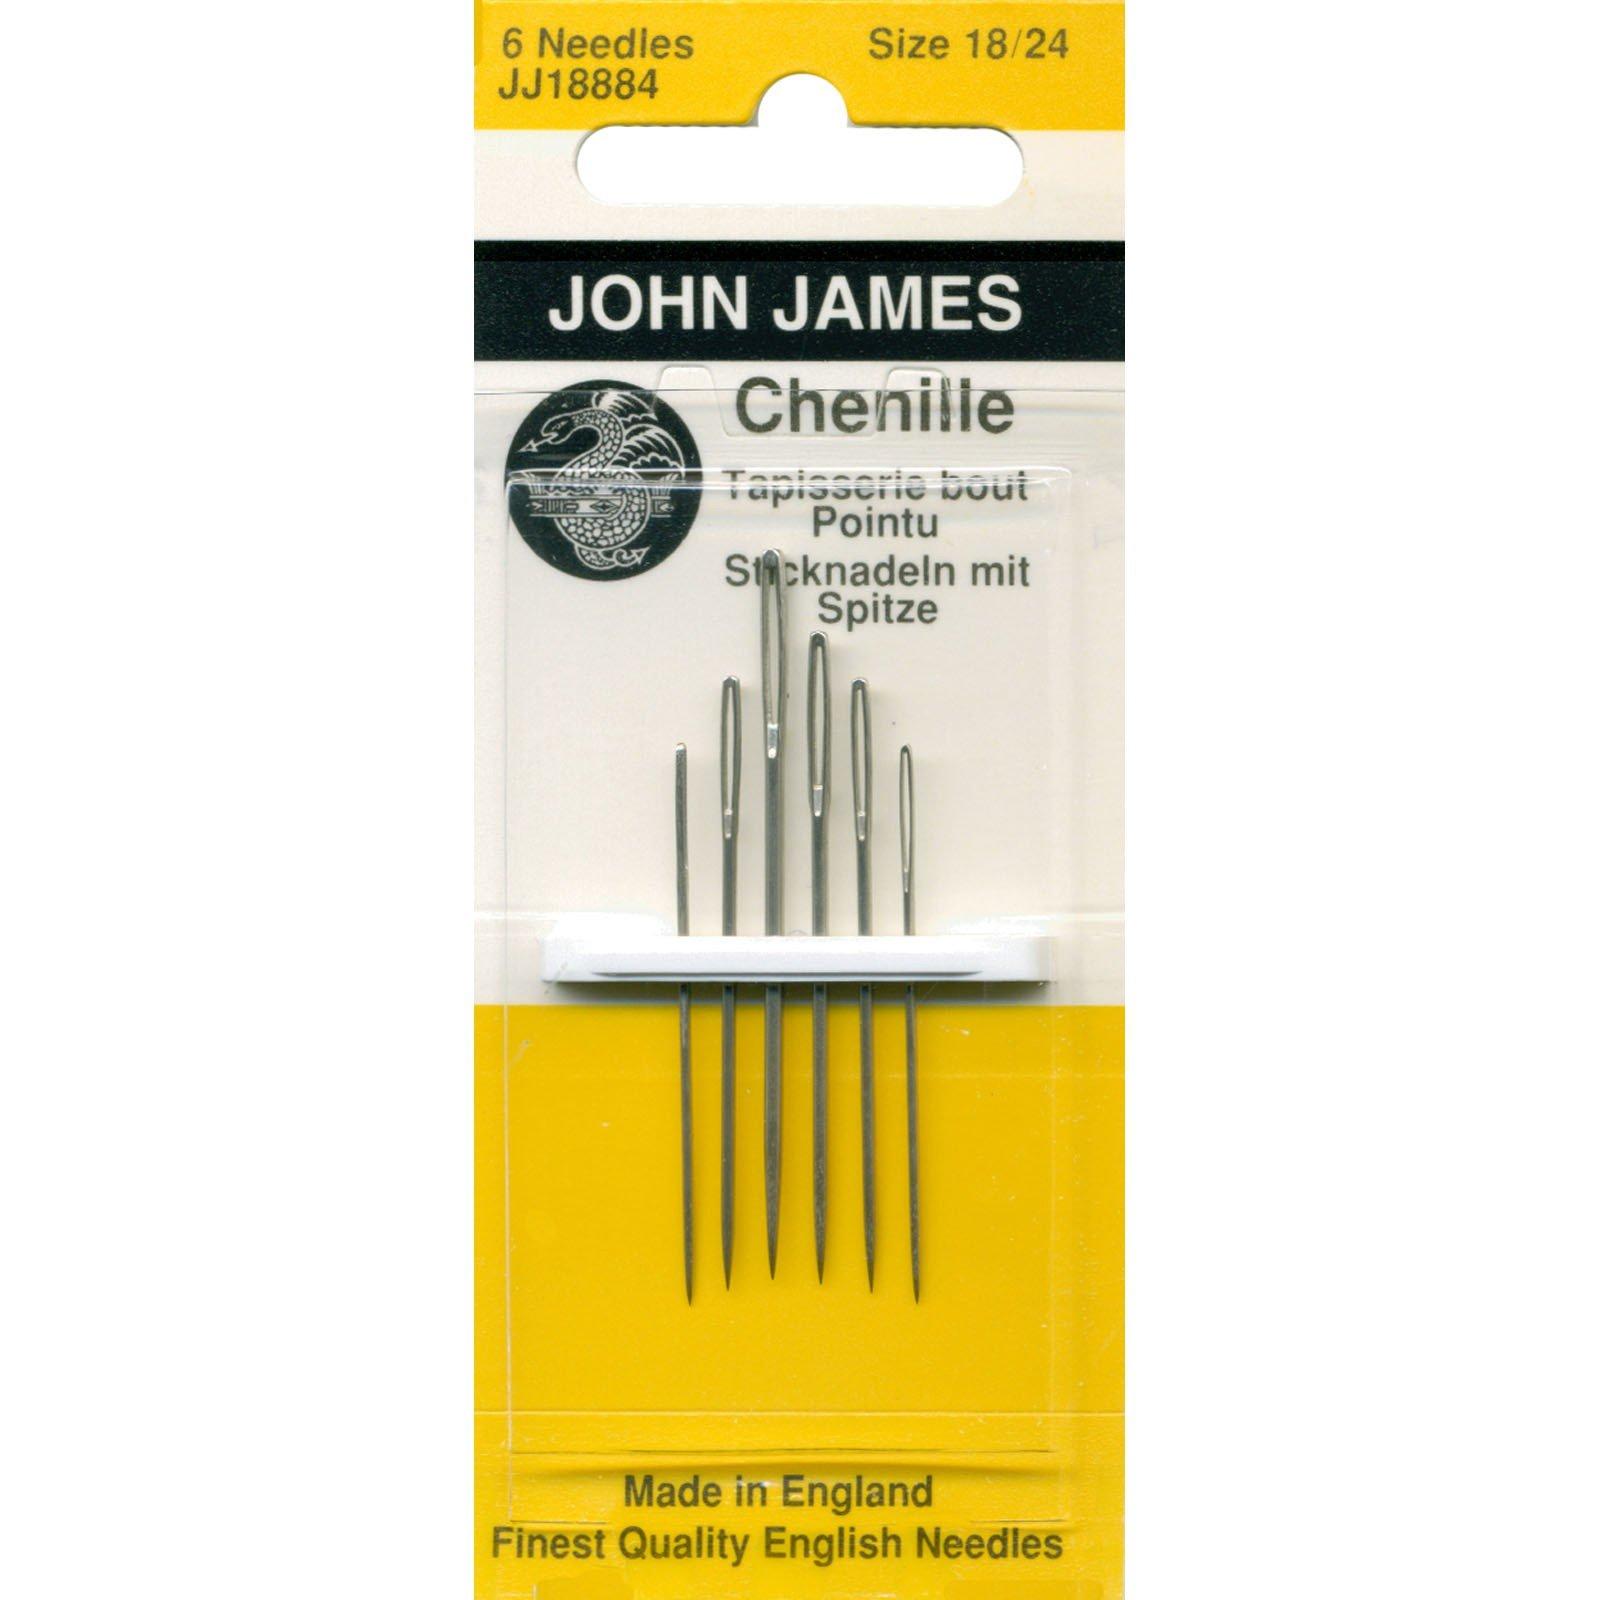 John James Chenille Needles #18 -24